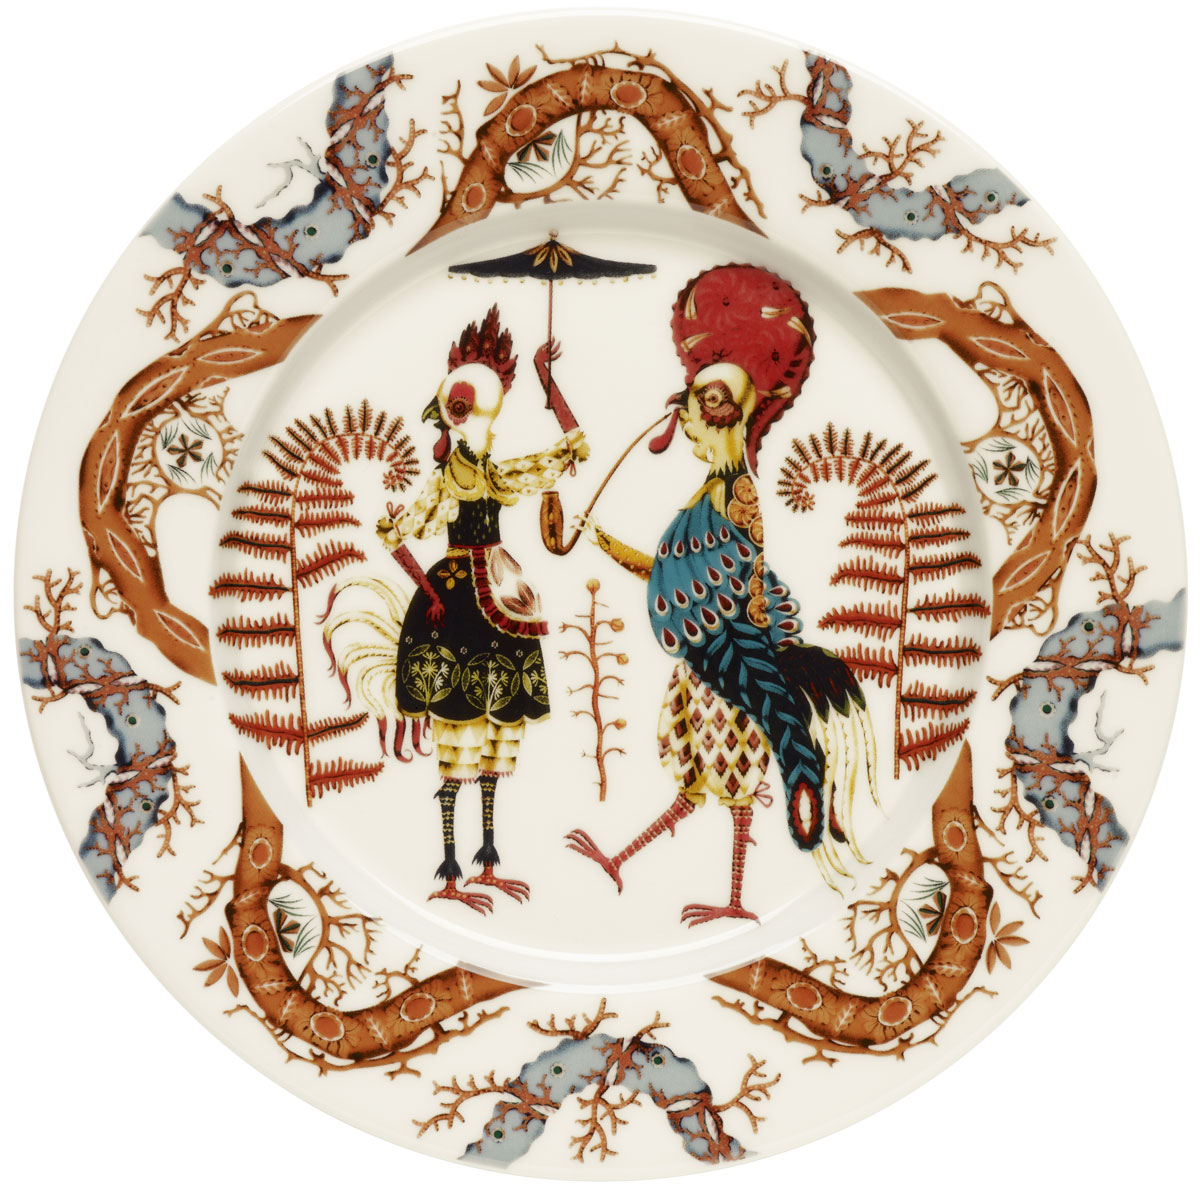 Тарелка Iittala Tanssi, диаметр 22 см1015529